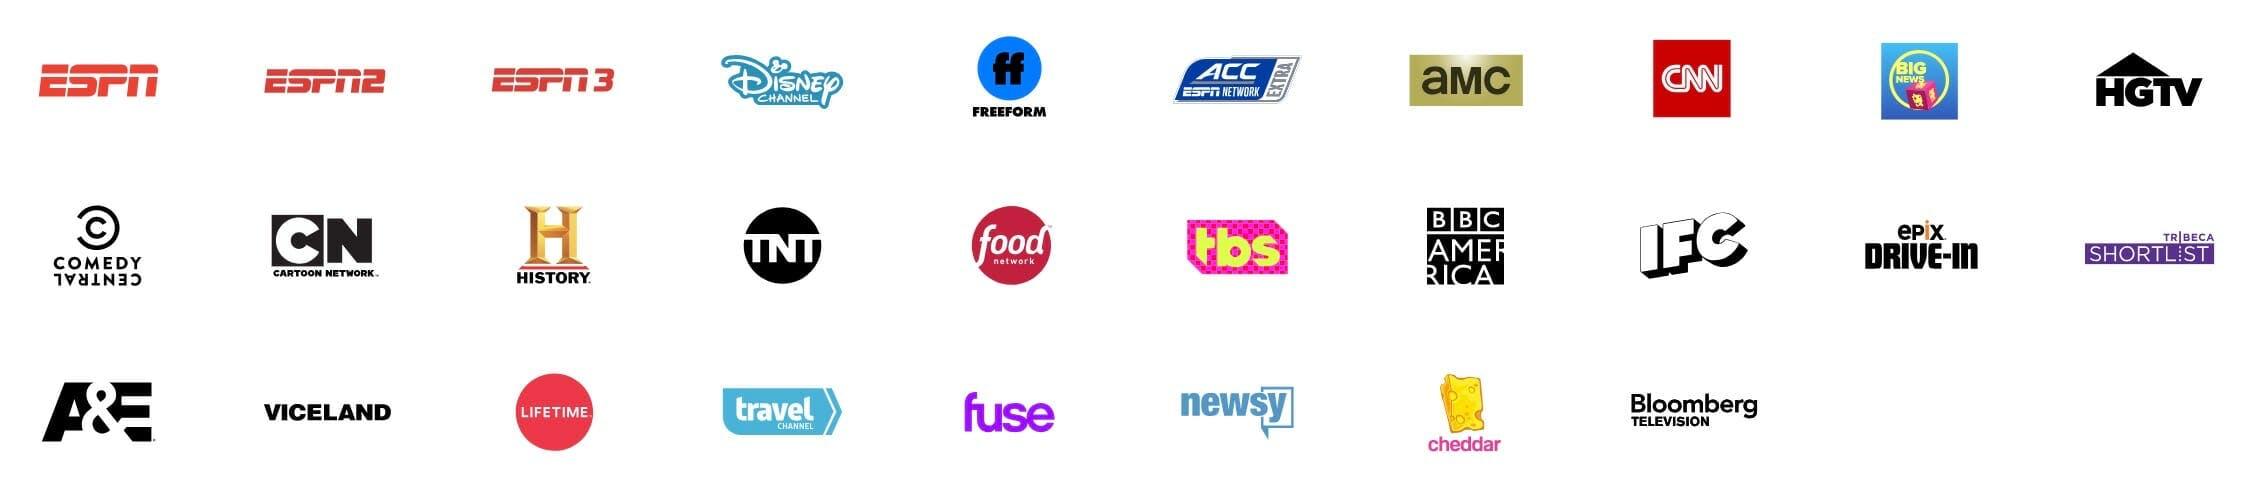 stream new mexico bowl 2018 sling tv